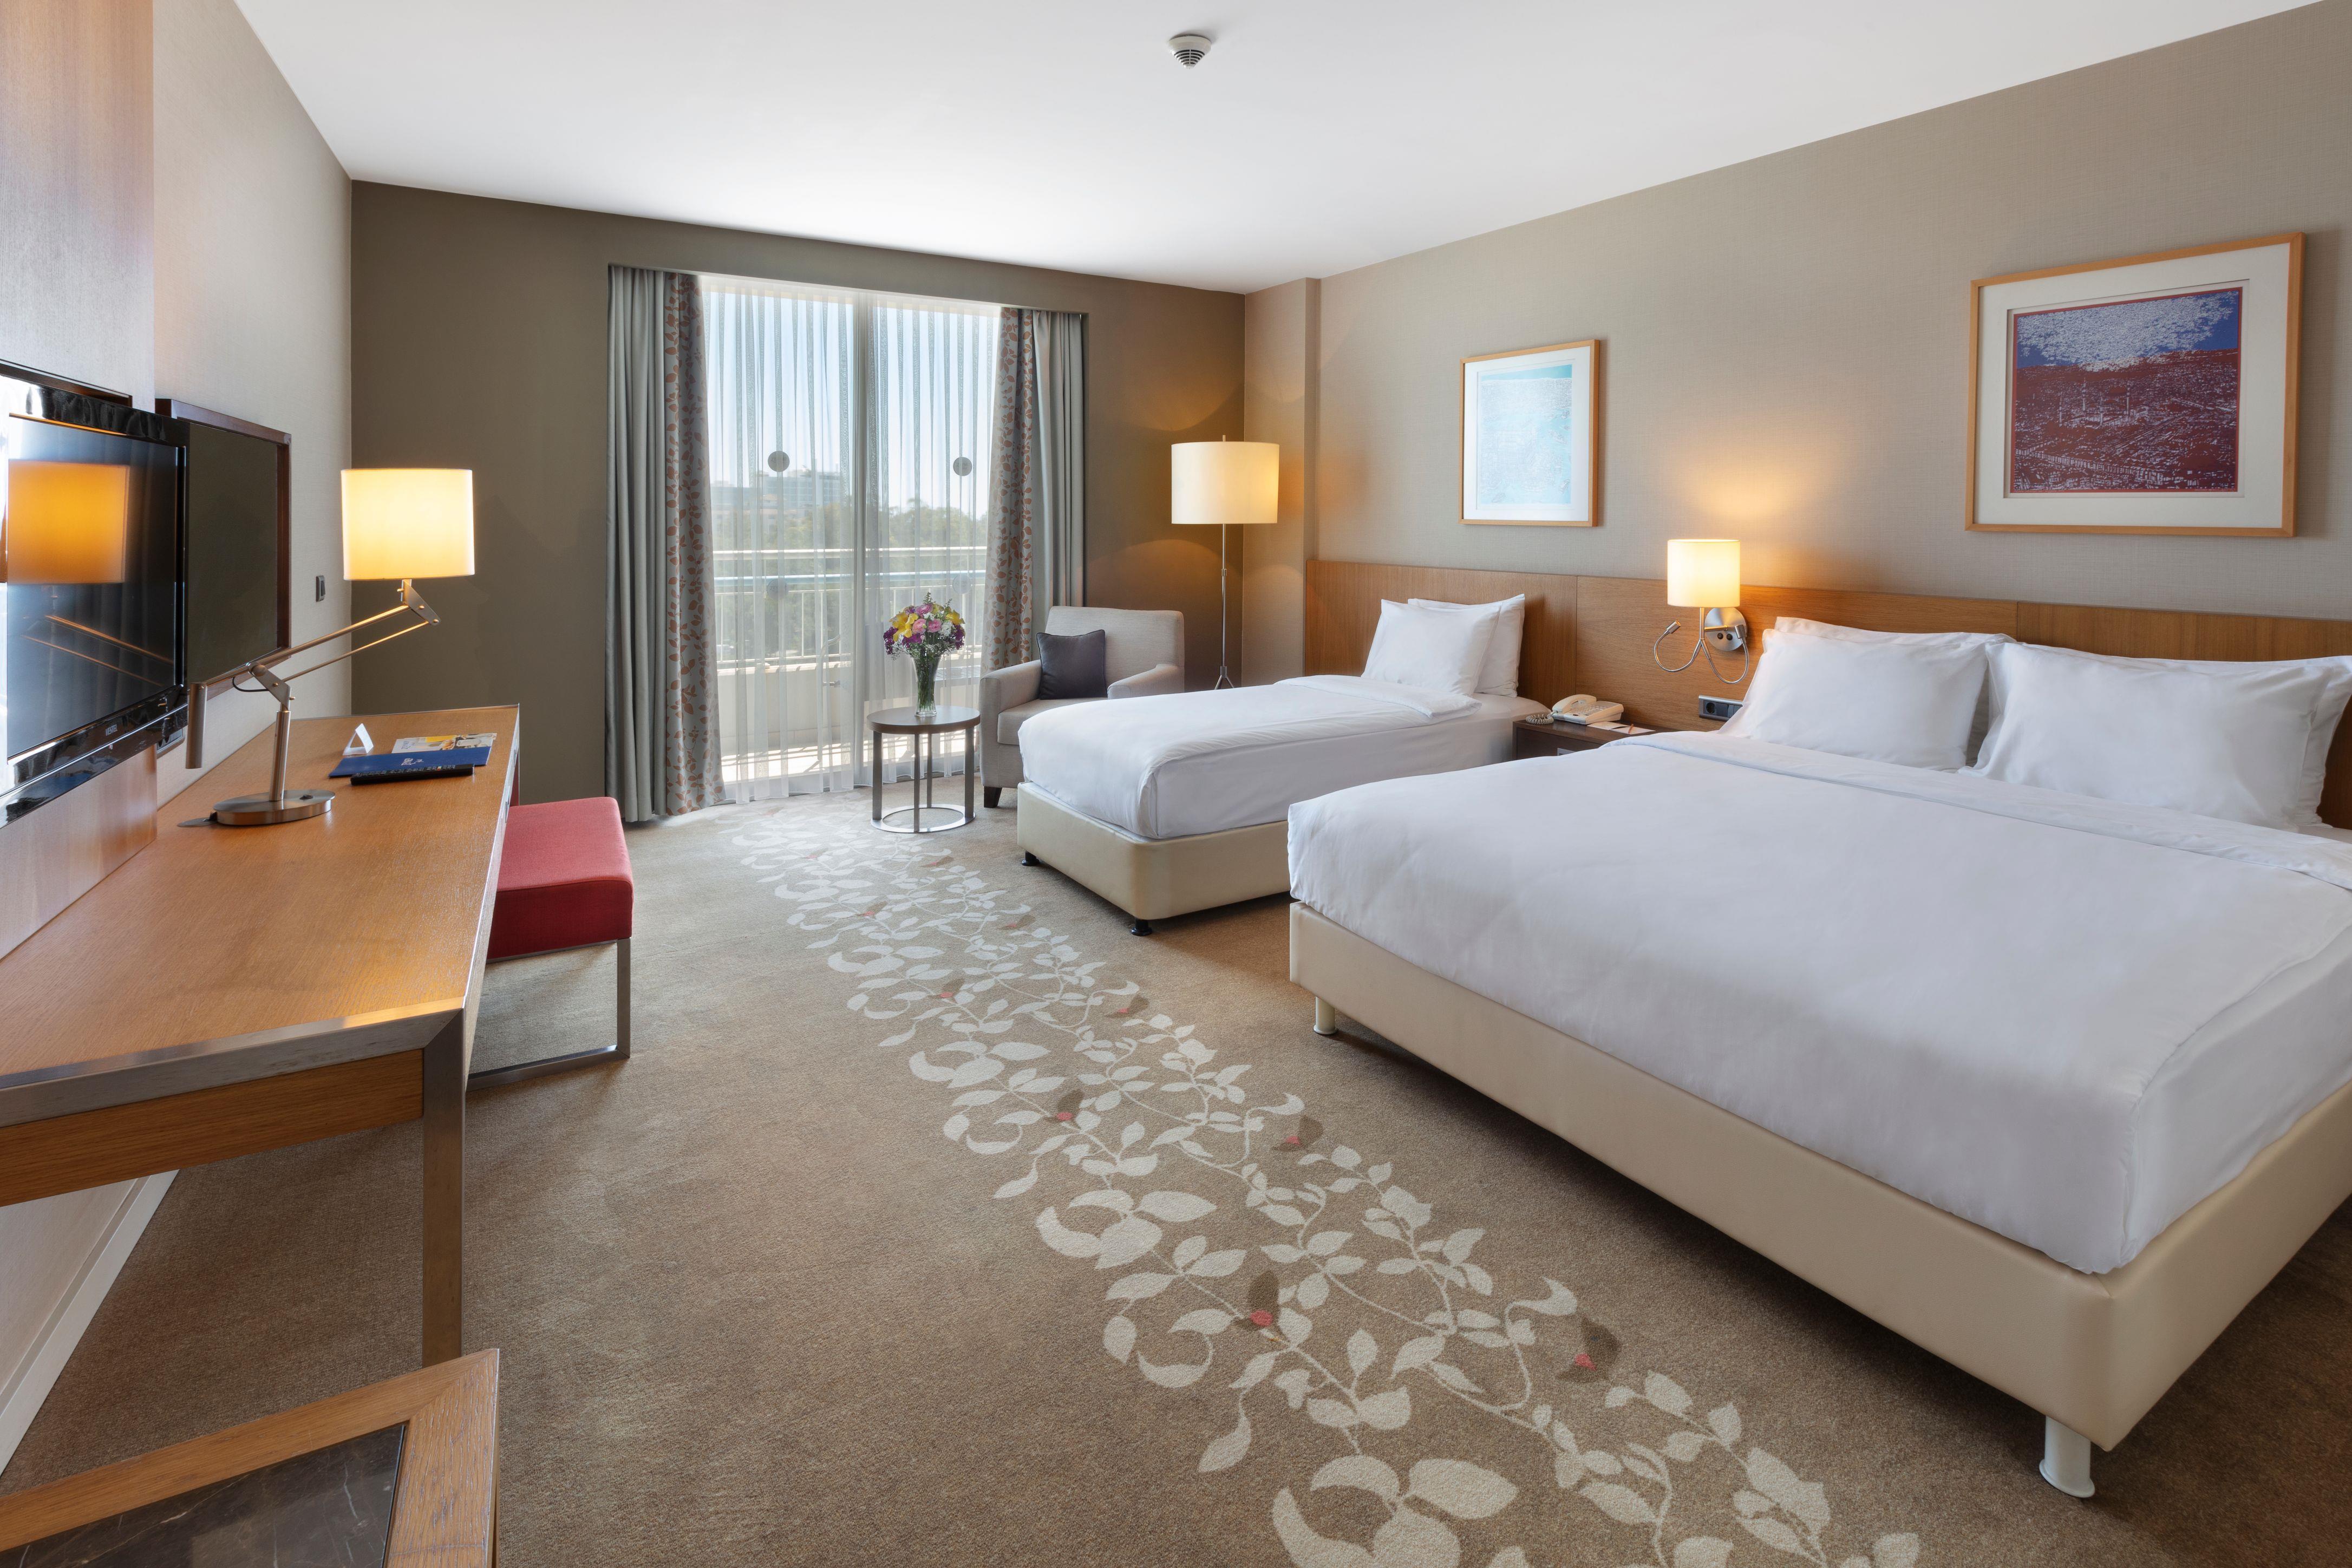 http://www.orextravel.sk/OREX/hotelphotos/zeynep-hotel-general-0010.jpg